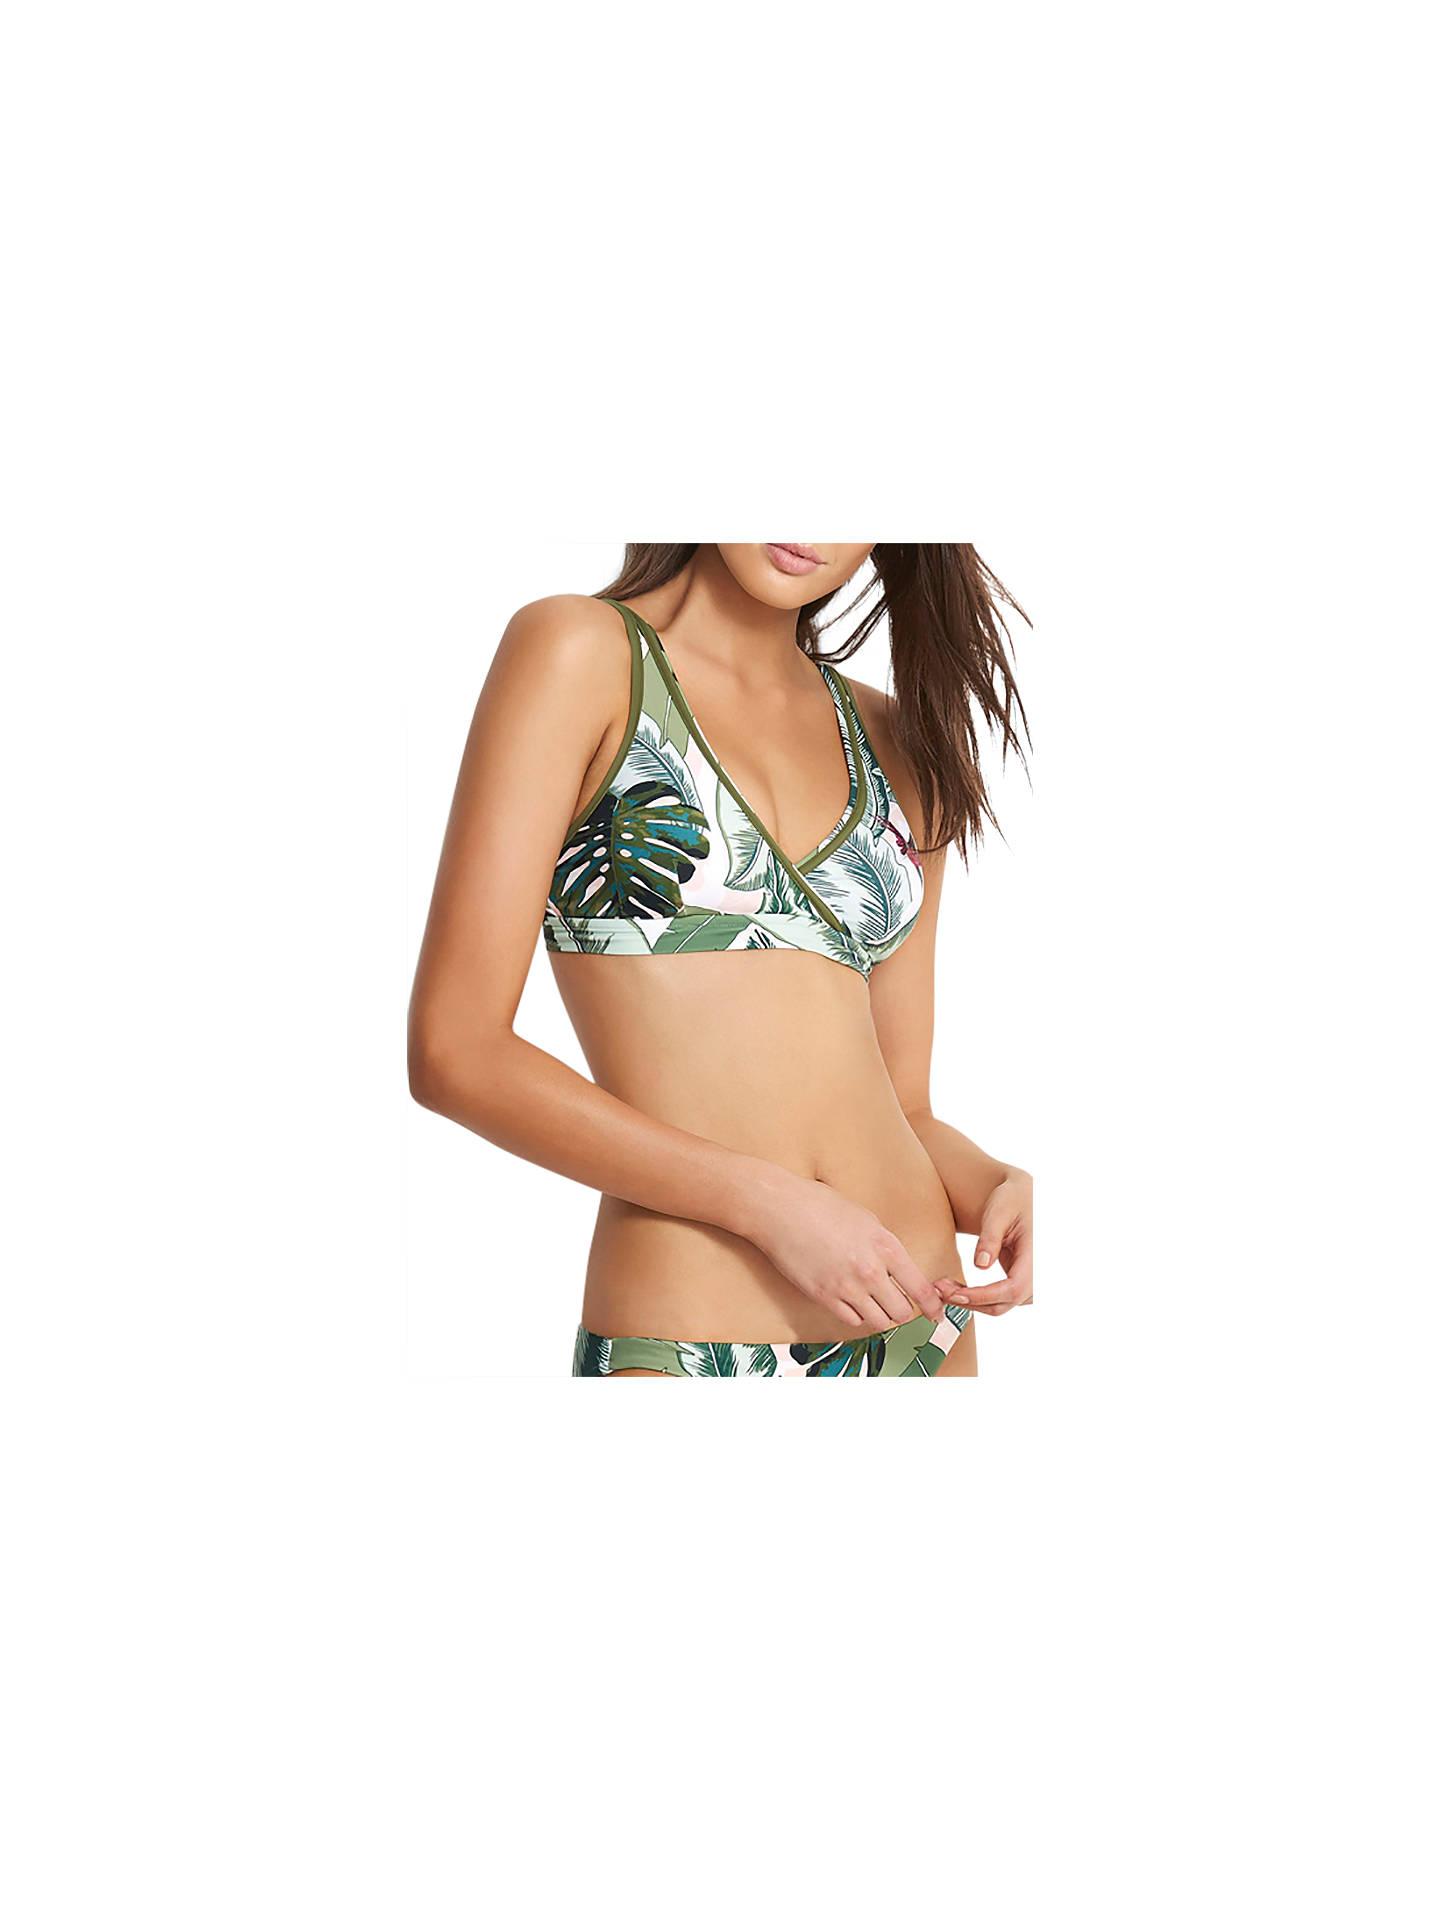 ddbf775bb09fd BuySeafolly Palm Beach Bikini Tank Top